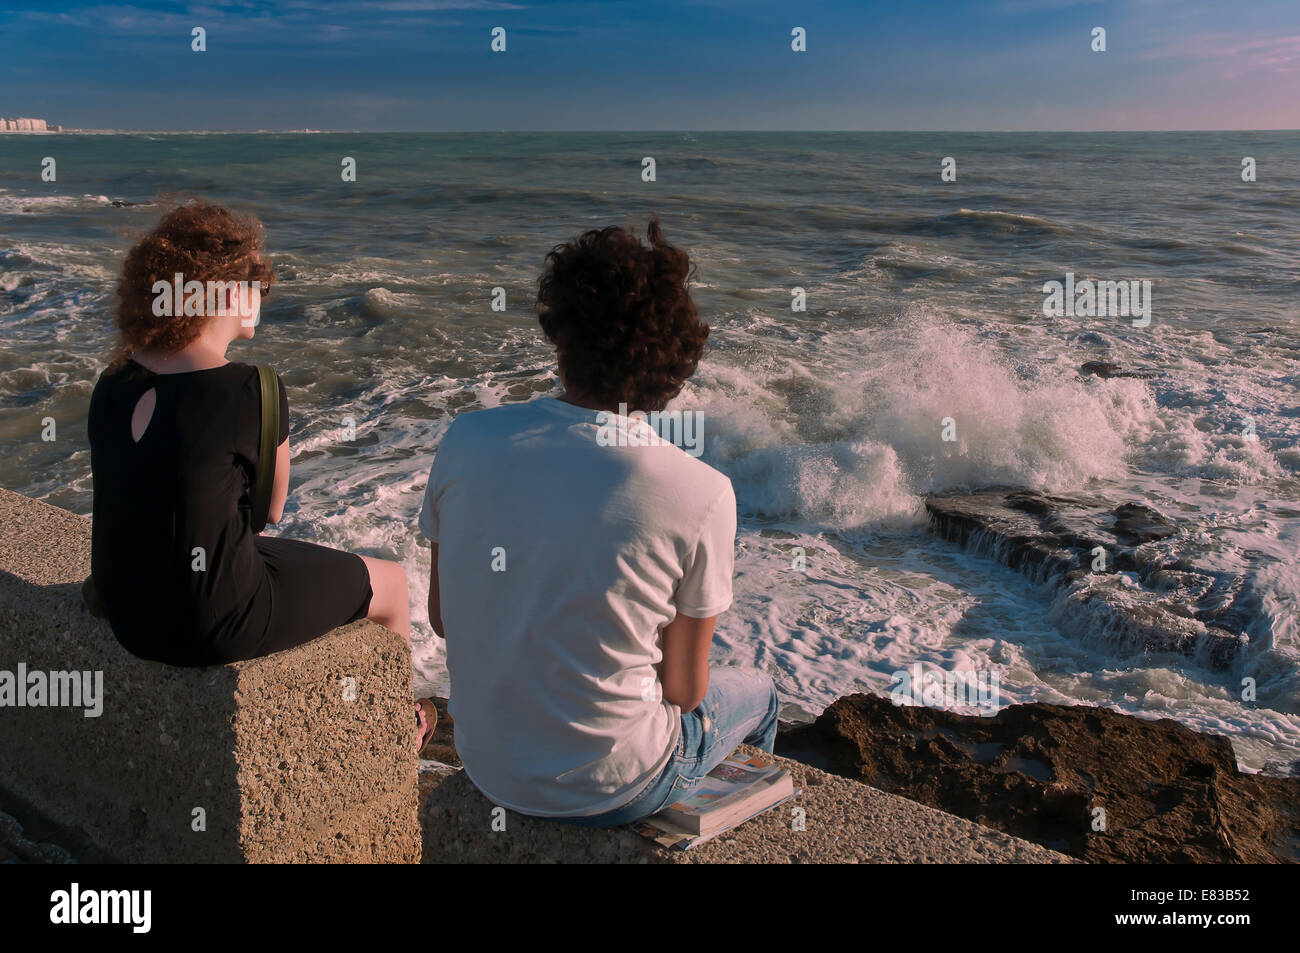 Breakwaters and foam, Cadiz, Region of Andalusia, Spain, Europe - Stock Image